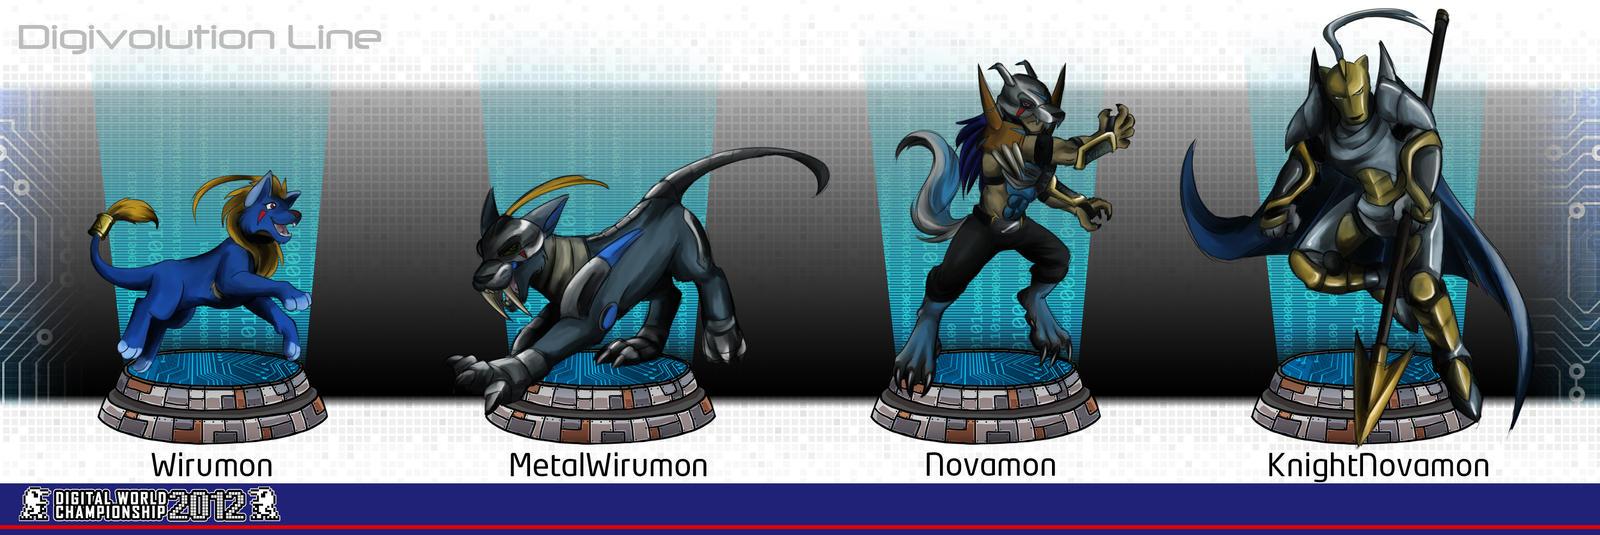 Demidevimon Evolution Line Wirumon evolution char...